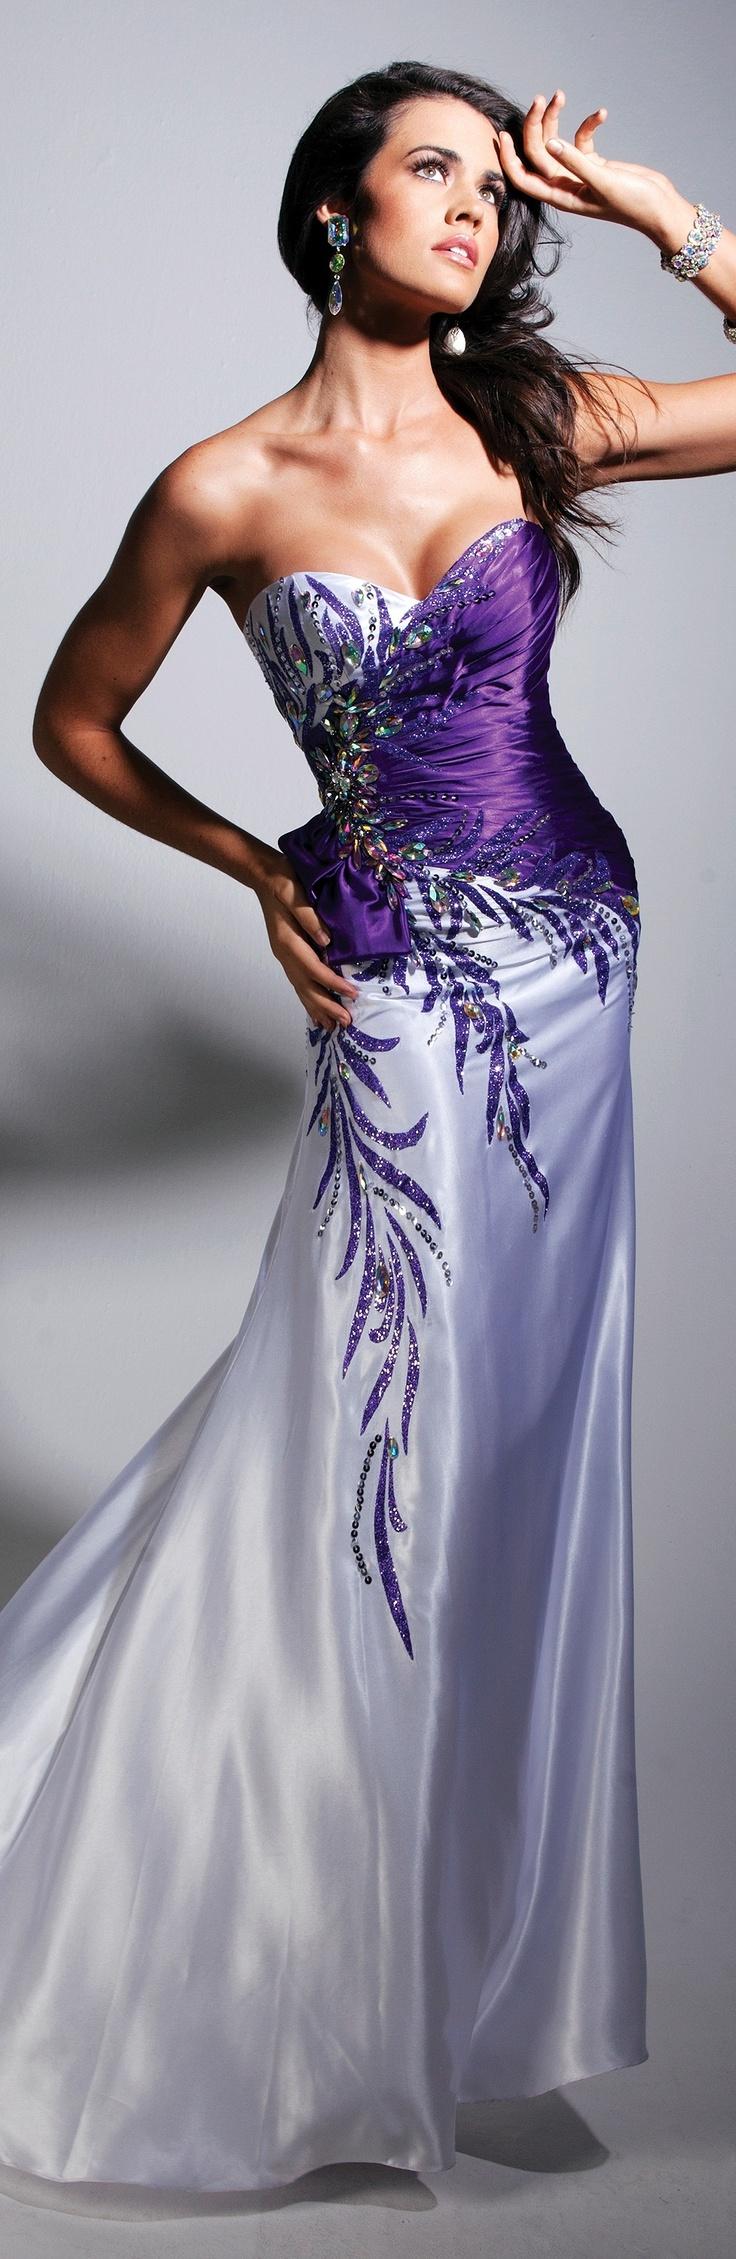 Dresses, Formal, Prom Dresses, Evening Wear: Long Strapless Sweetheart Purple…